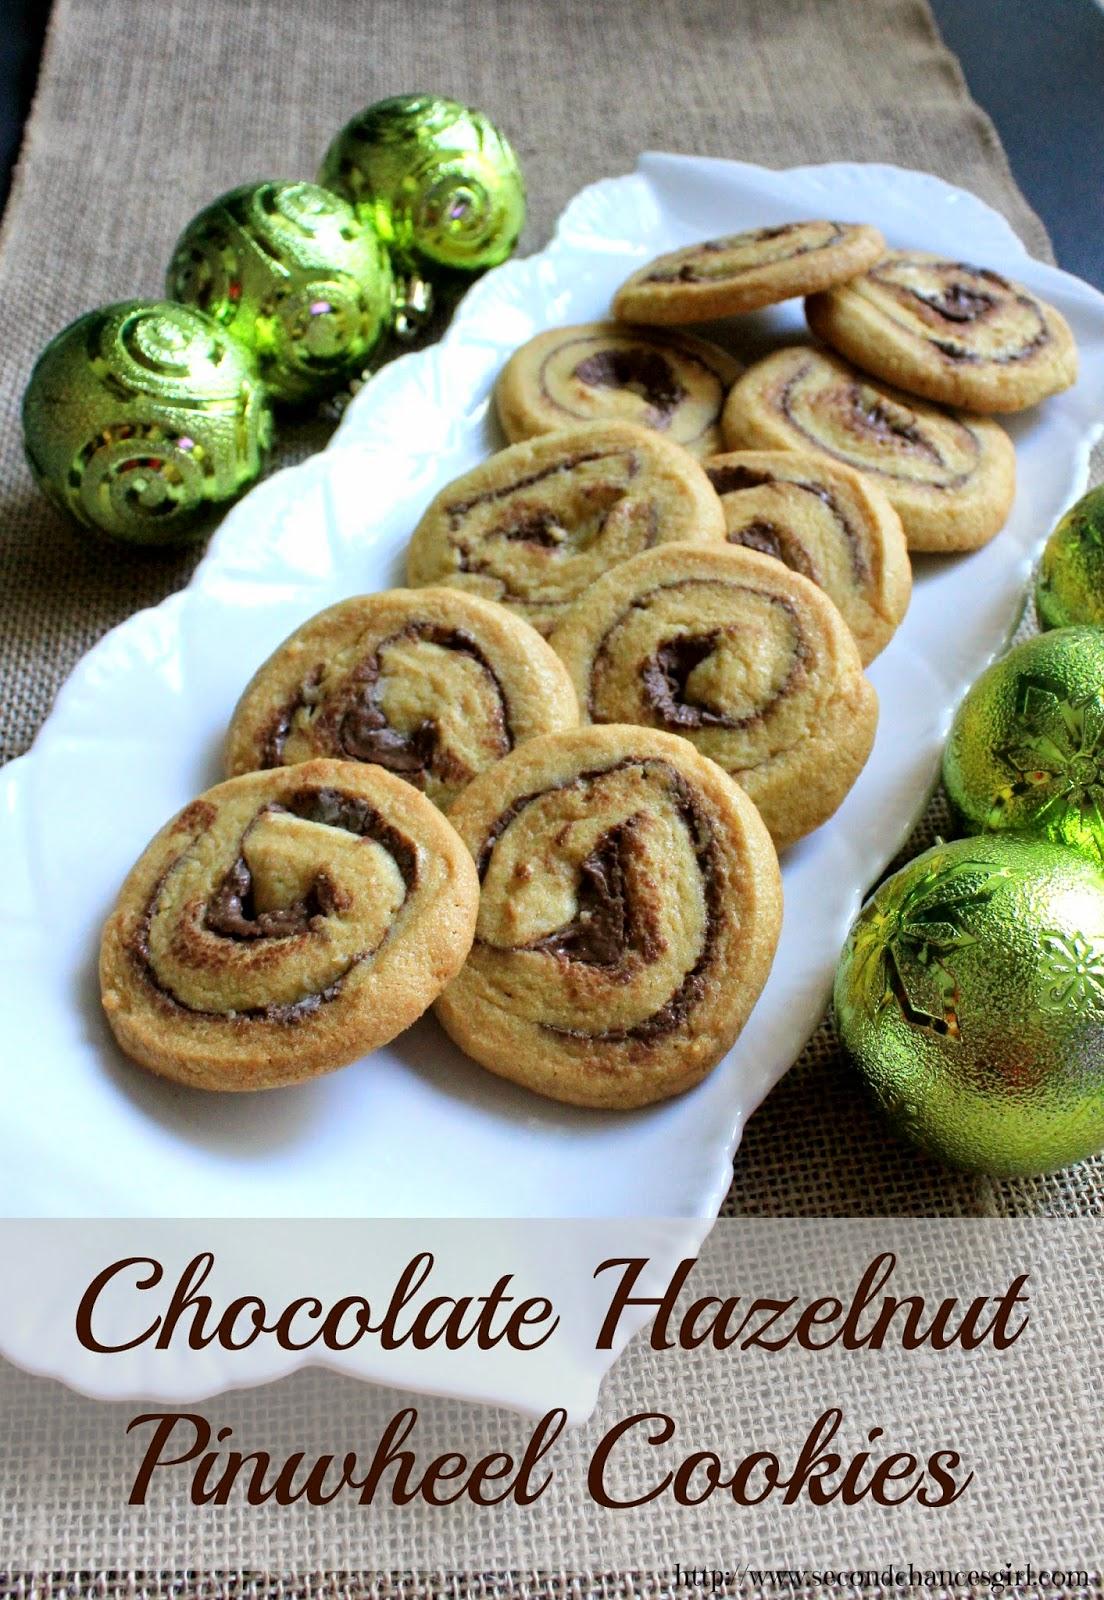 Chocolate Hazelnut Pinwheel Cookies #HolidayMadeSimple #ad